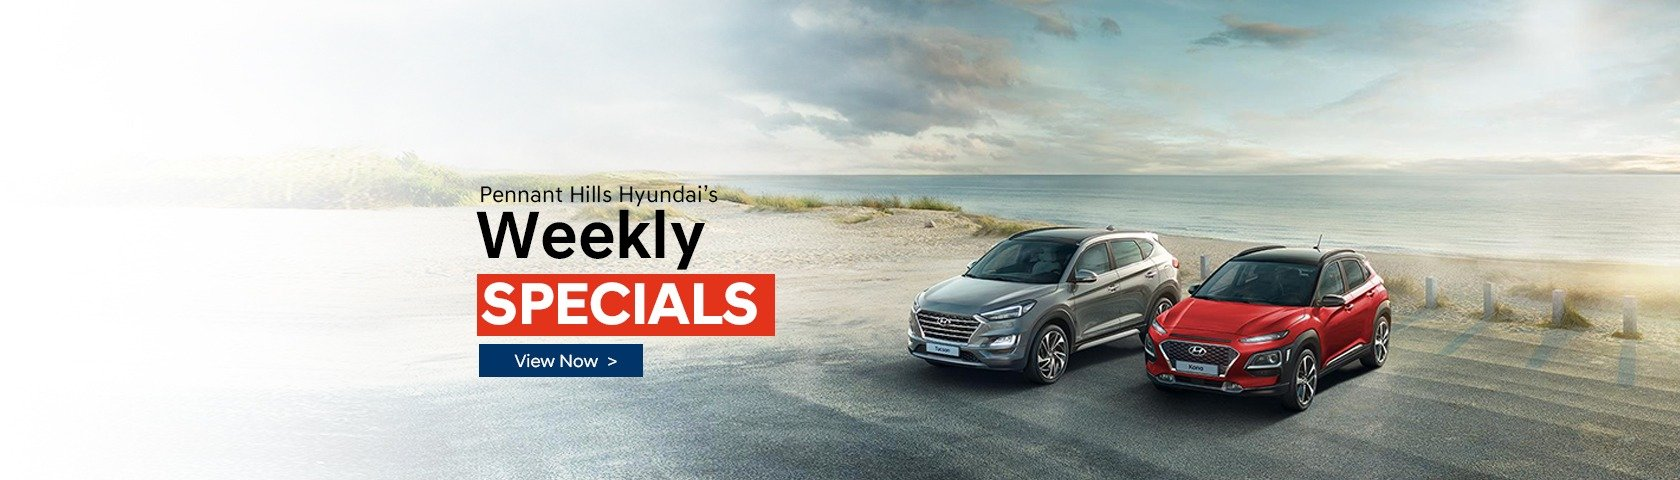 Pennant Hills Hyundai - Specials